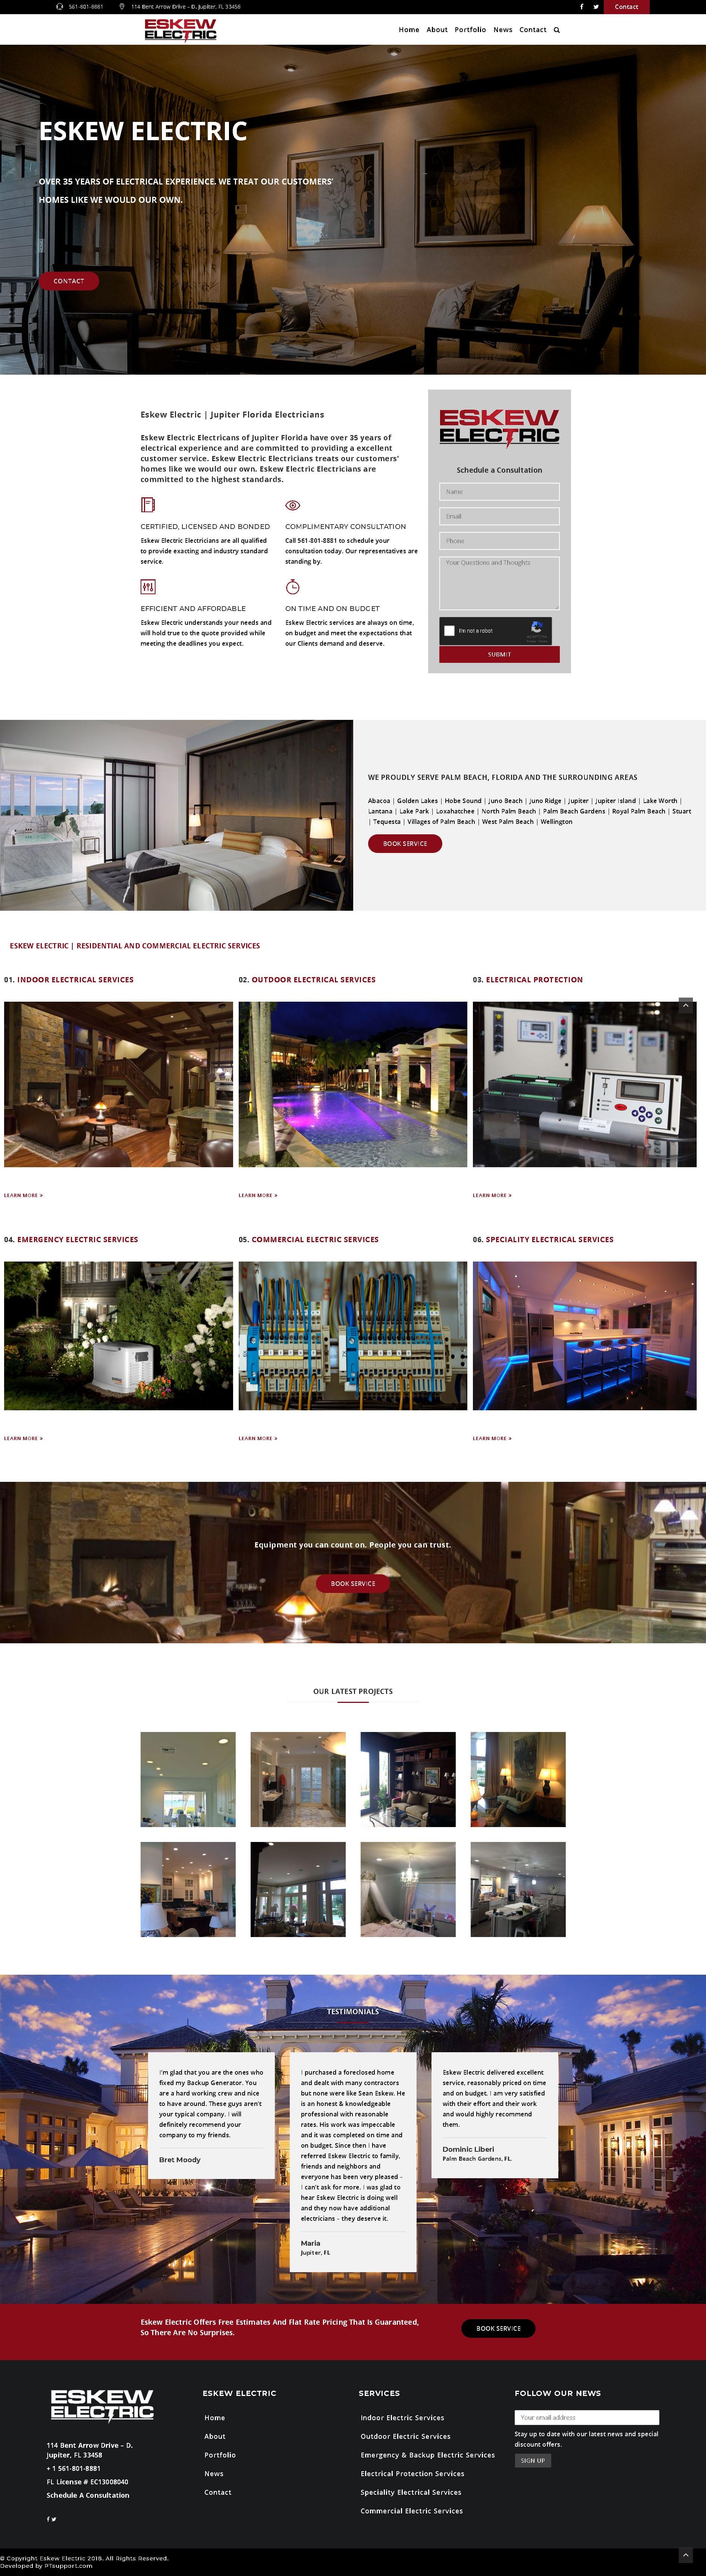 Eskew Electric | PTsupport Website Development